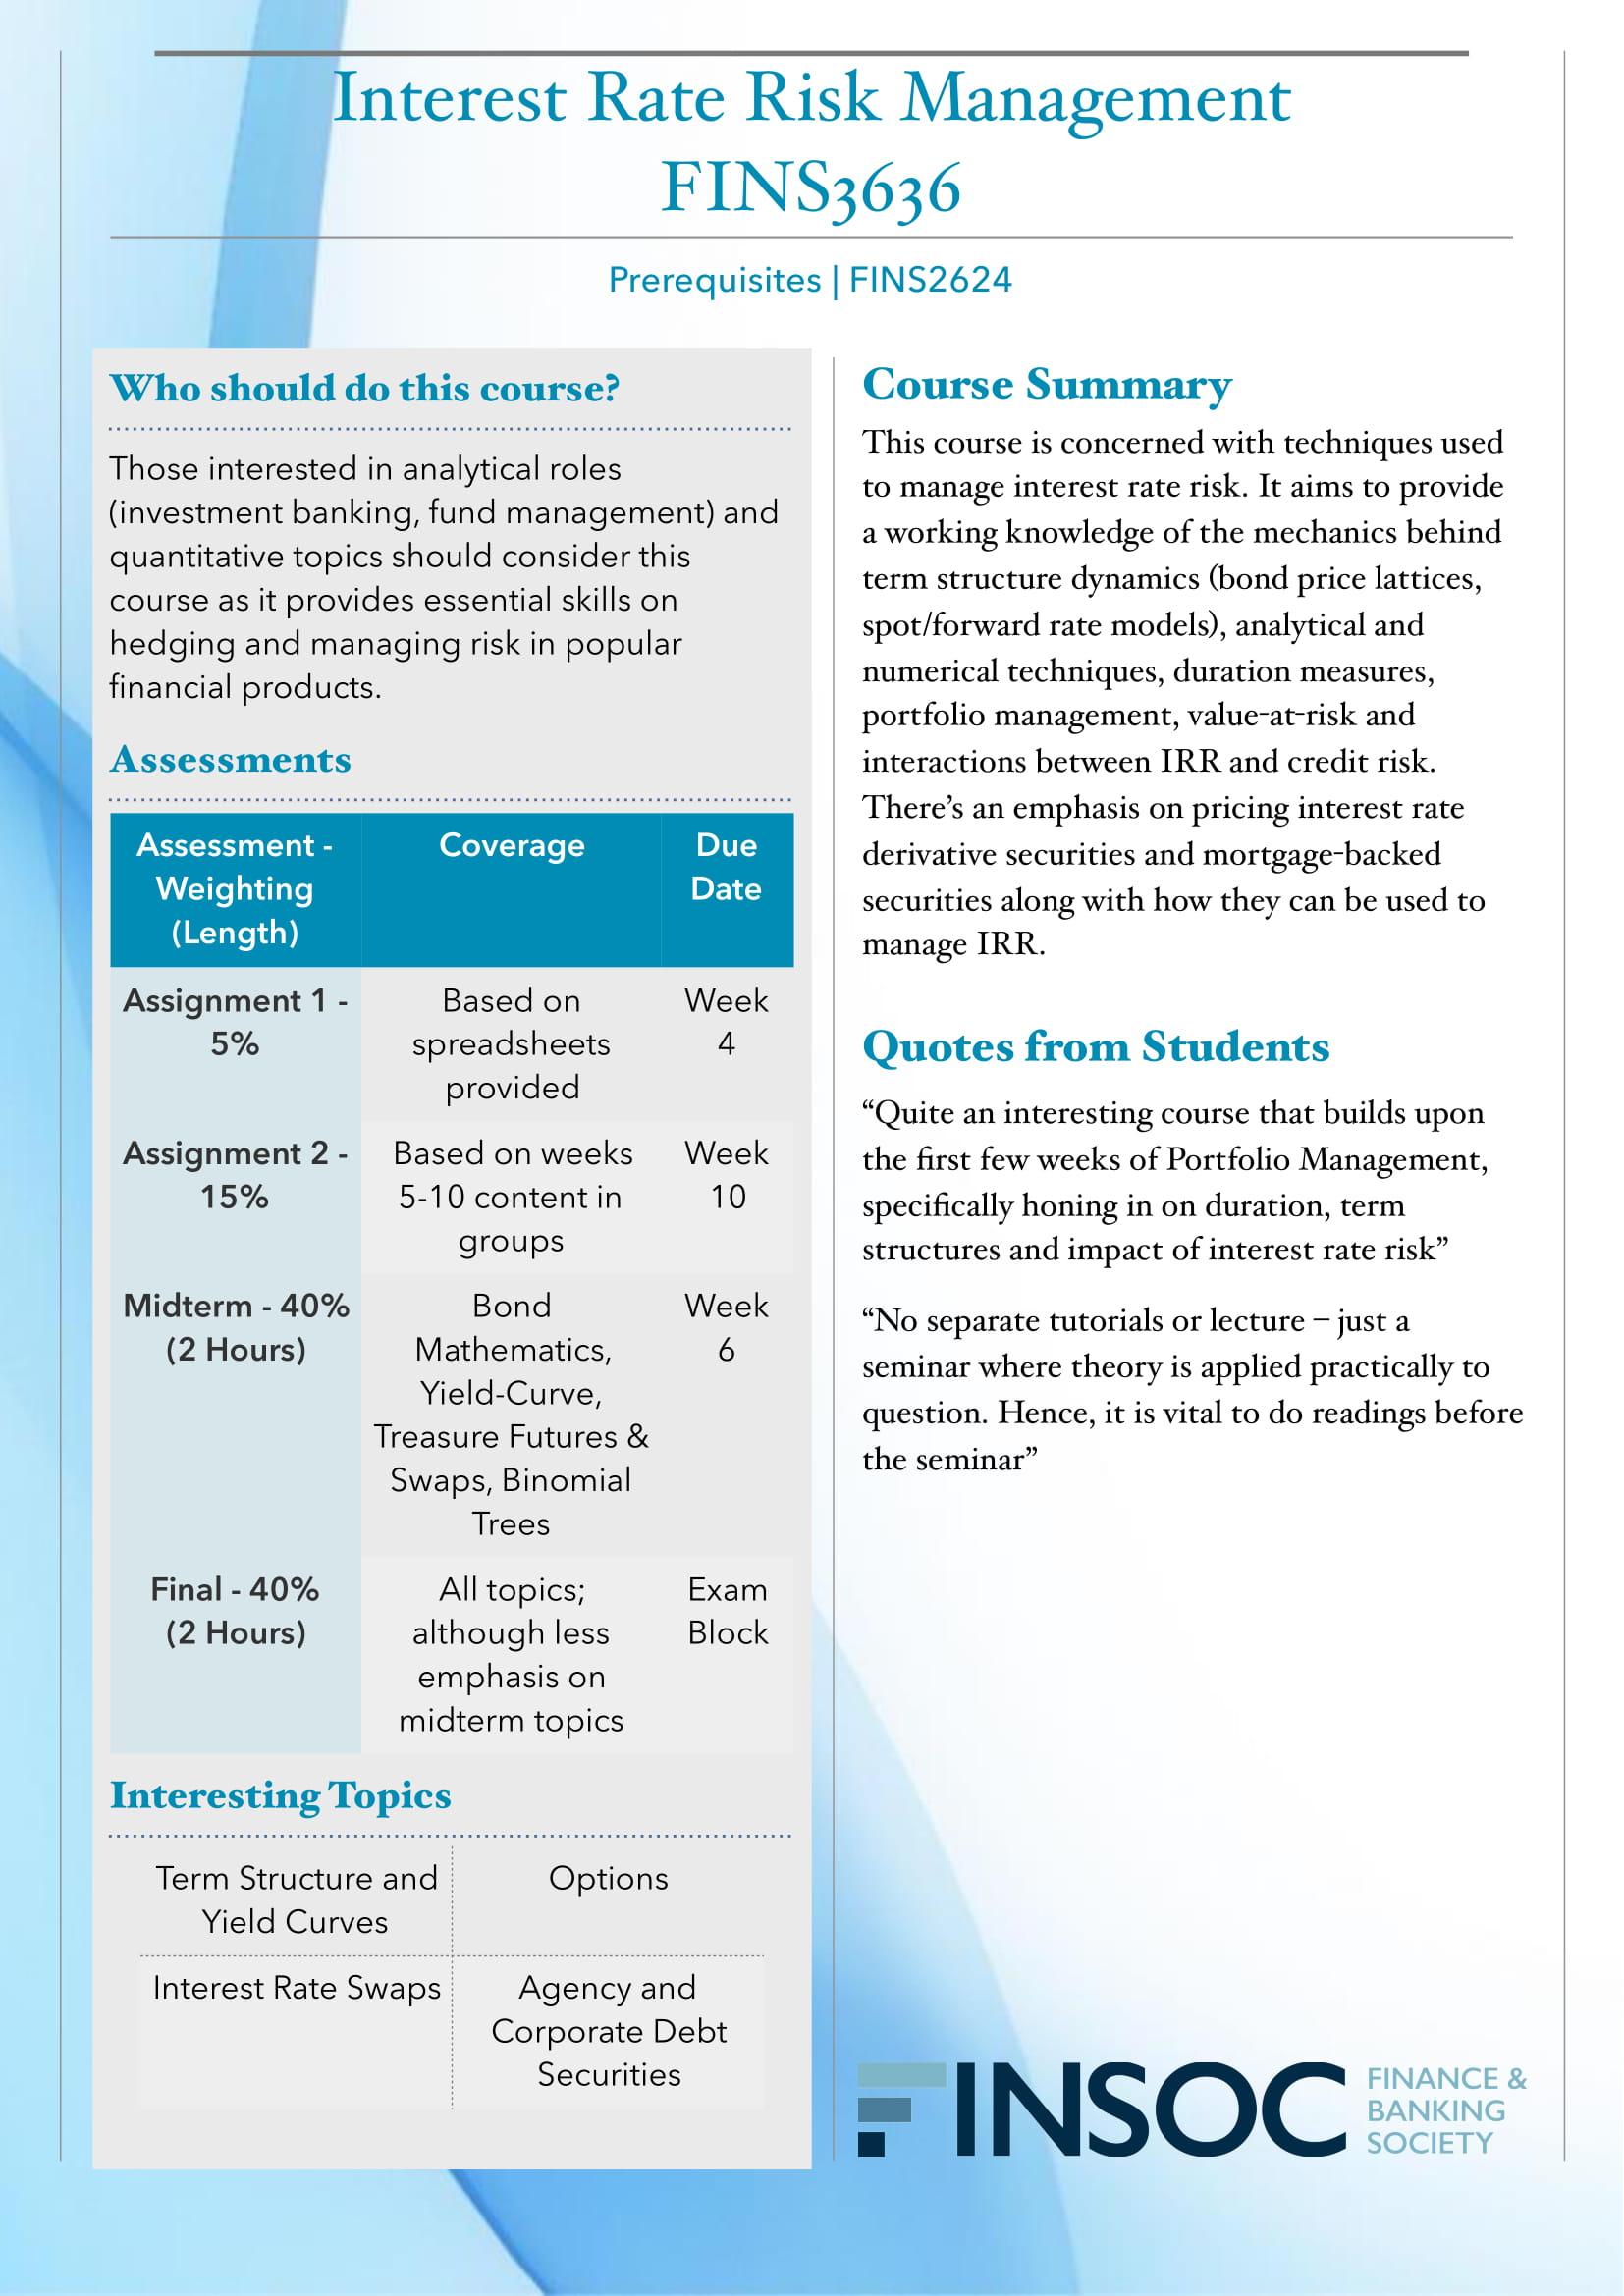 FINS3636 Interest Rate Risk Managementimage preview for post